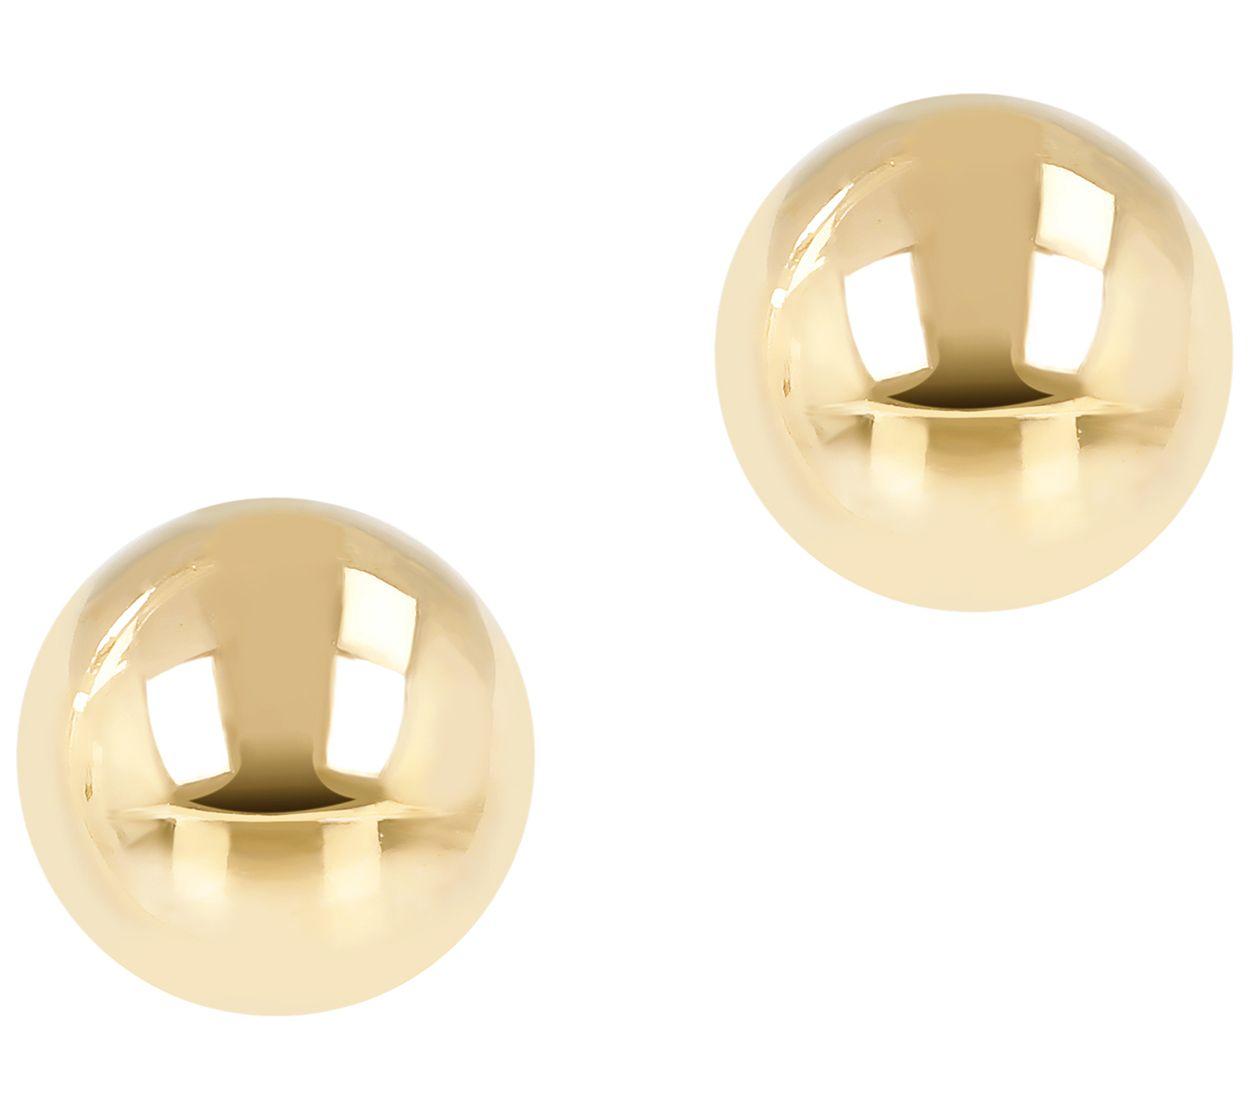 EternaGold Polished 8mm Ball Stud Earrings, 14K Gold